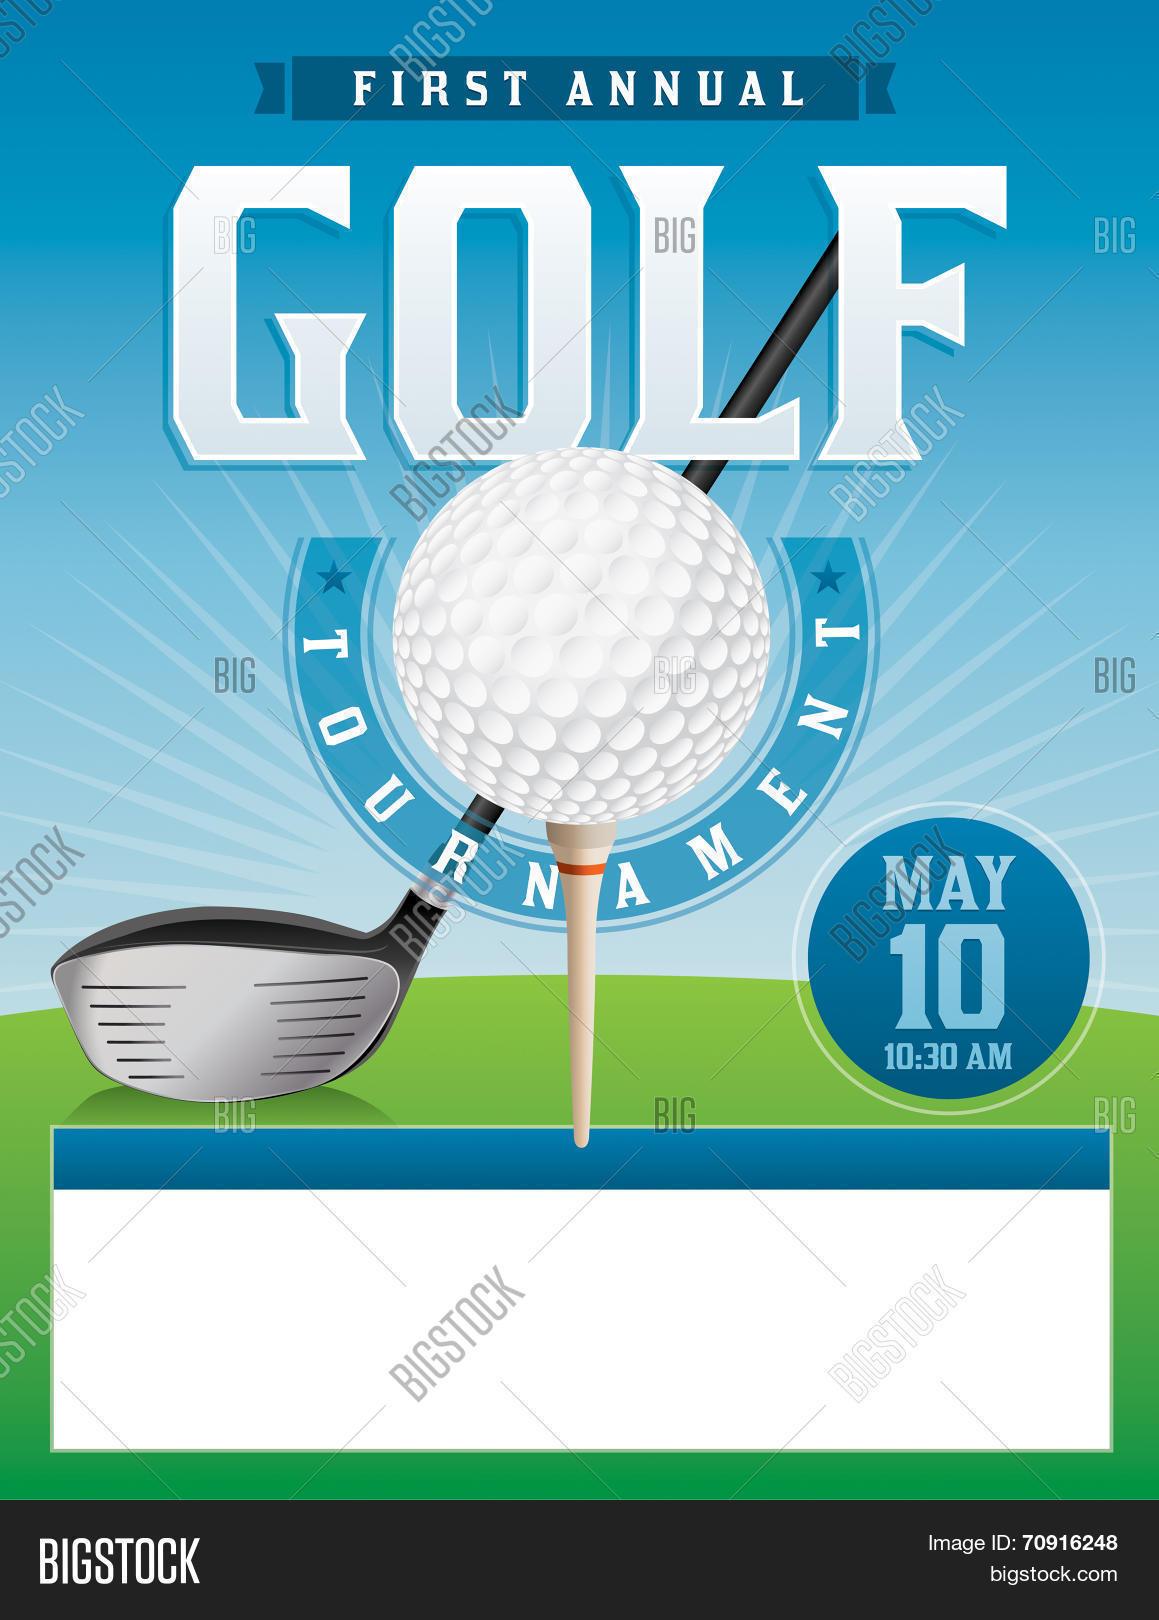 golf tournament illustration vector photo bigstock. Black Bedroom Furniture Sets. Home Design Ideas